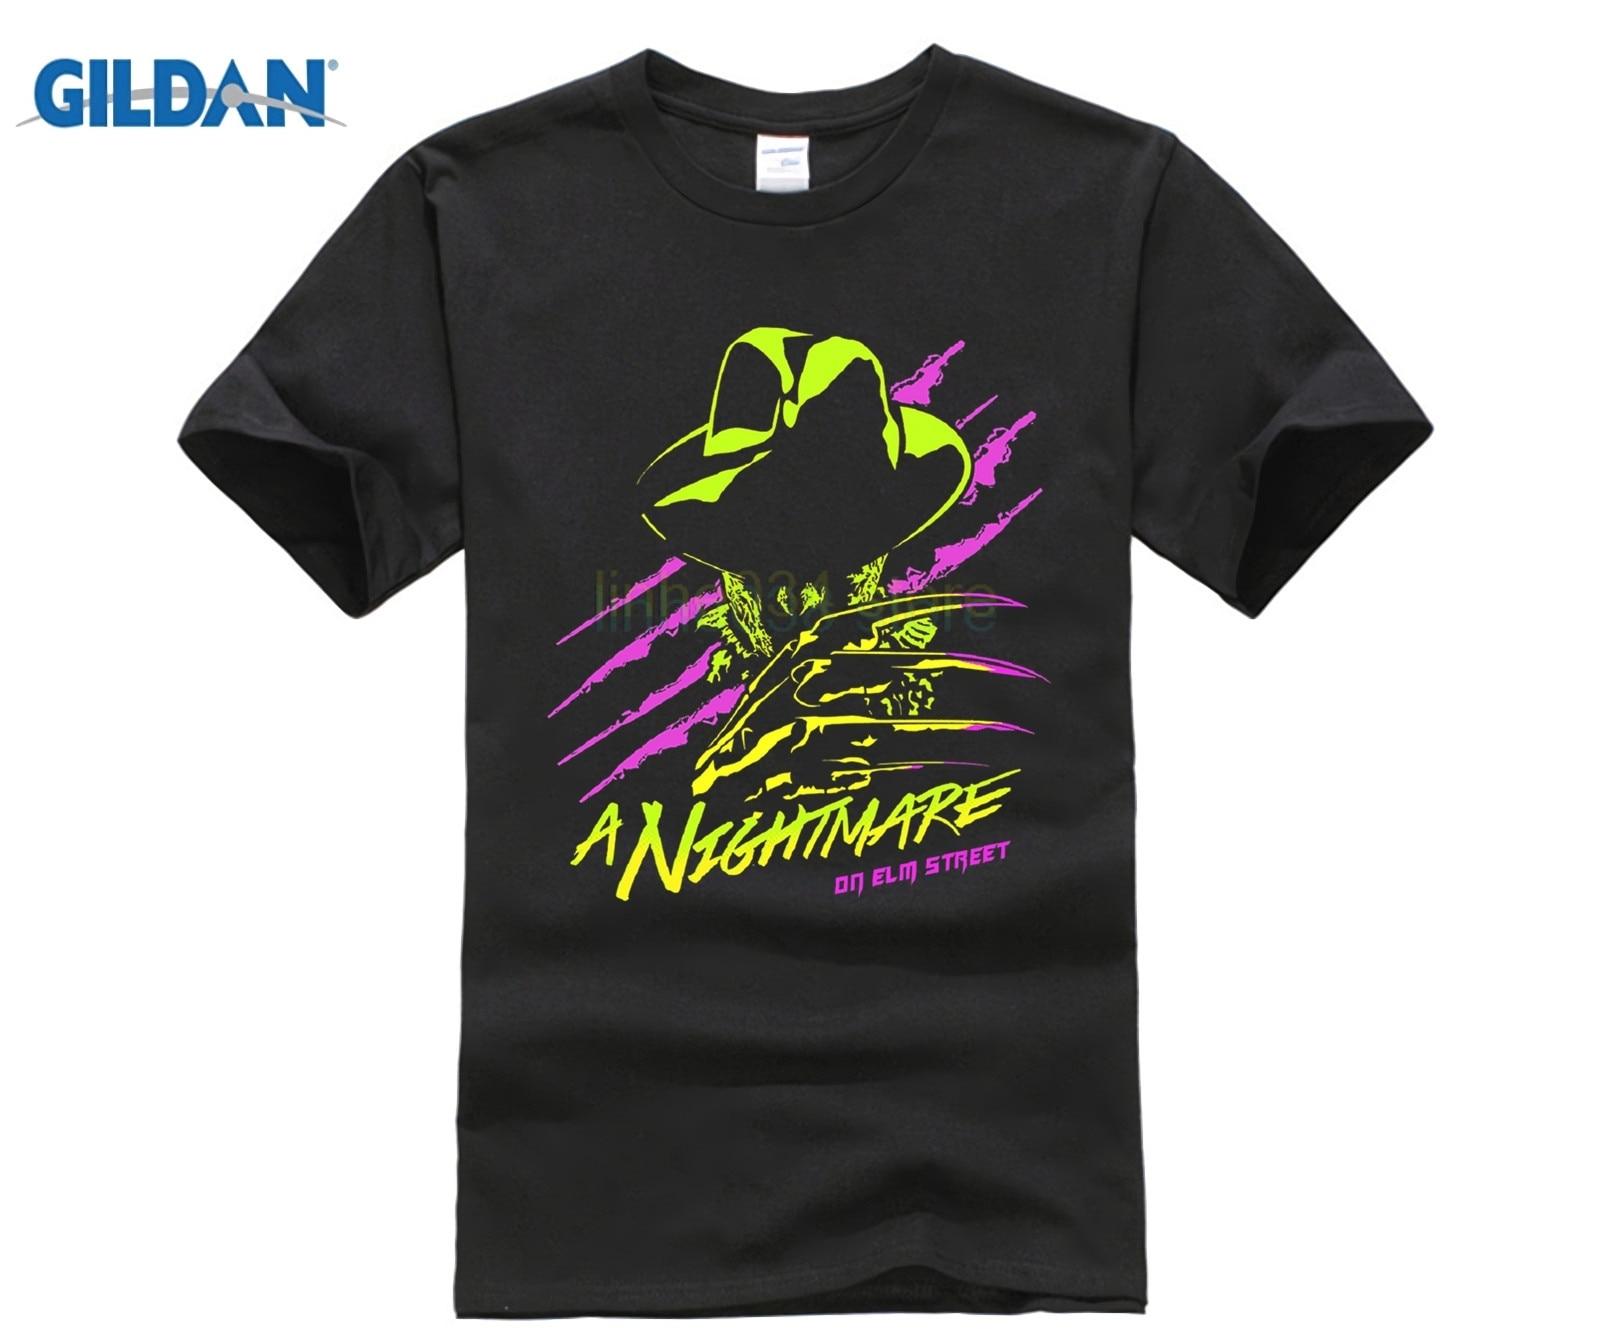 1a964113774 Icon Emoji Fashion Design T-Shirt Neon Freddy Krueger Nightmare On Elm  Street T-